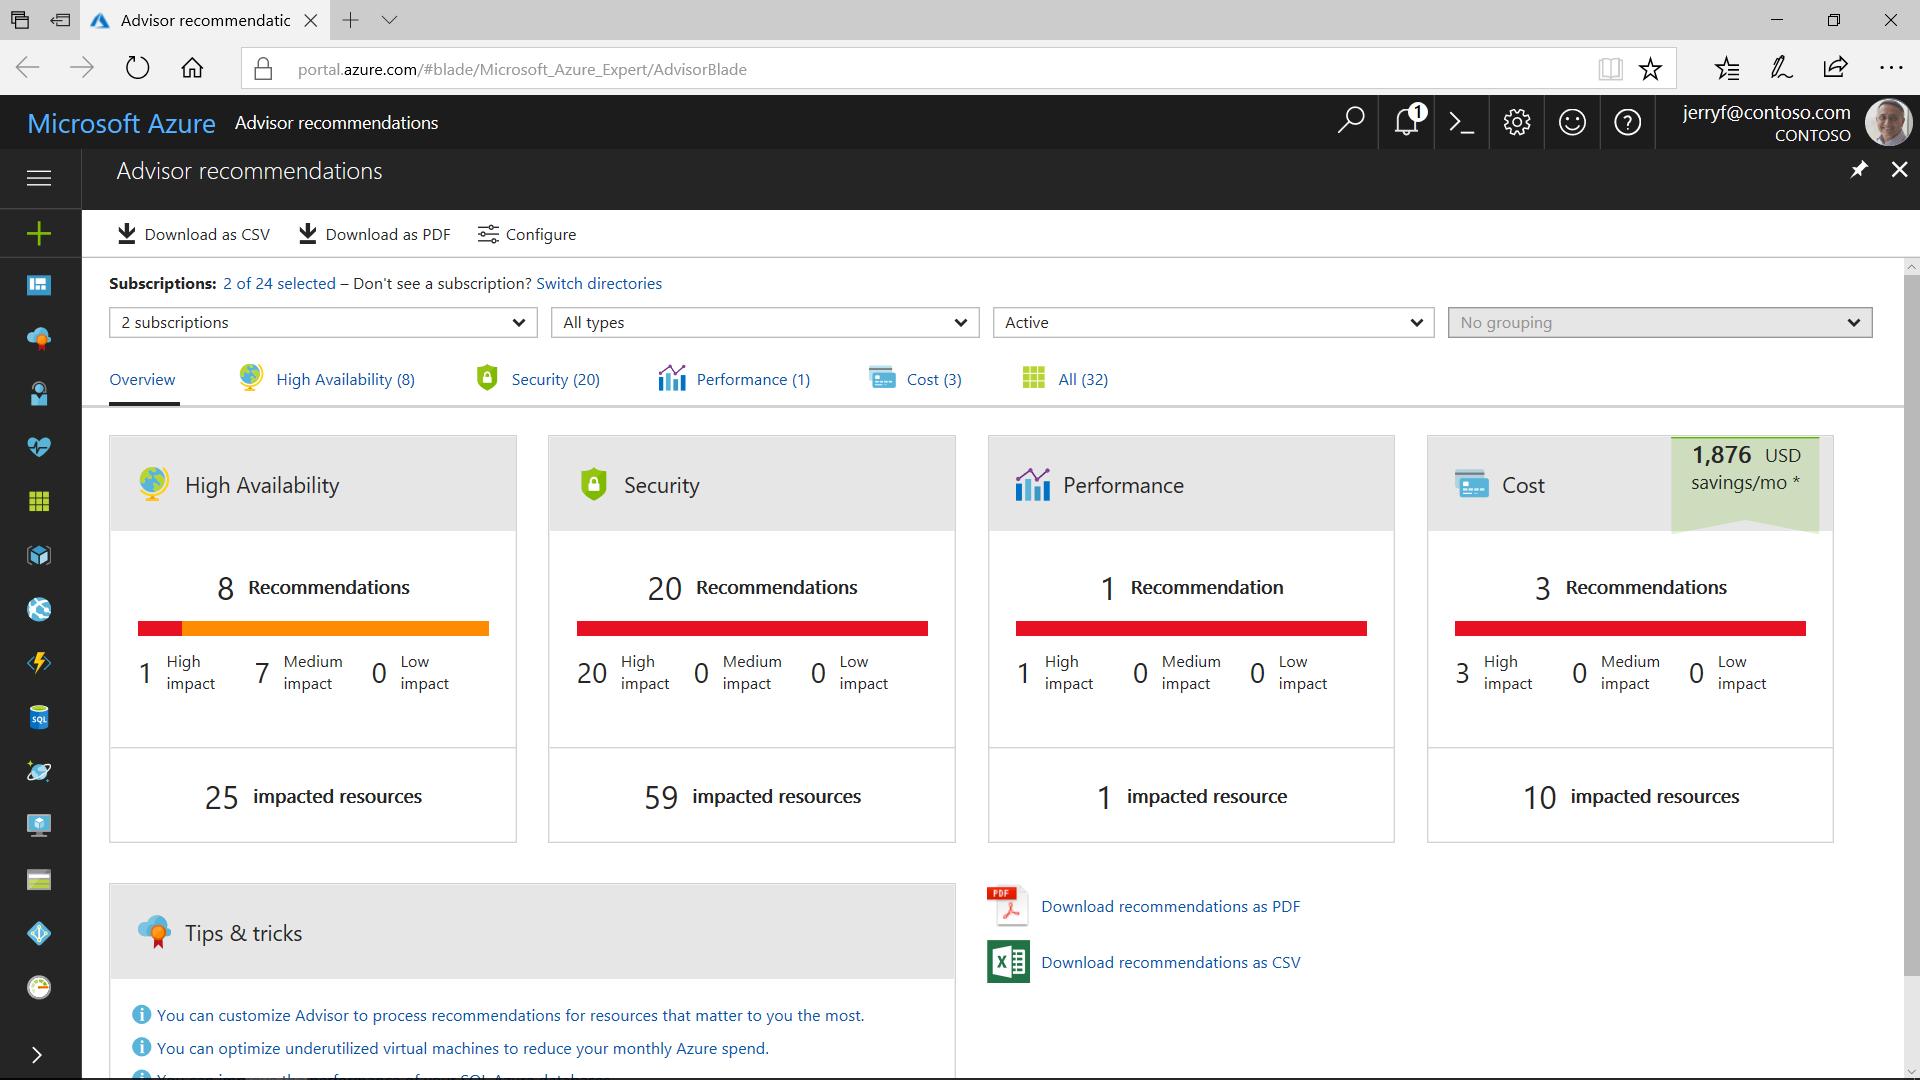 Microsoft Azure Advisor - dashboad